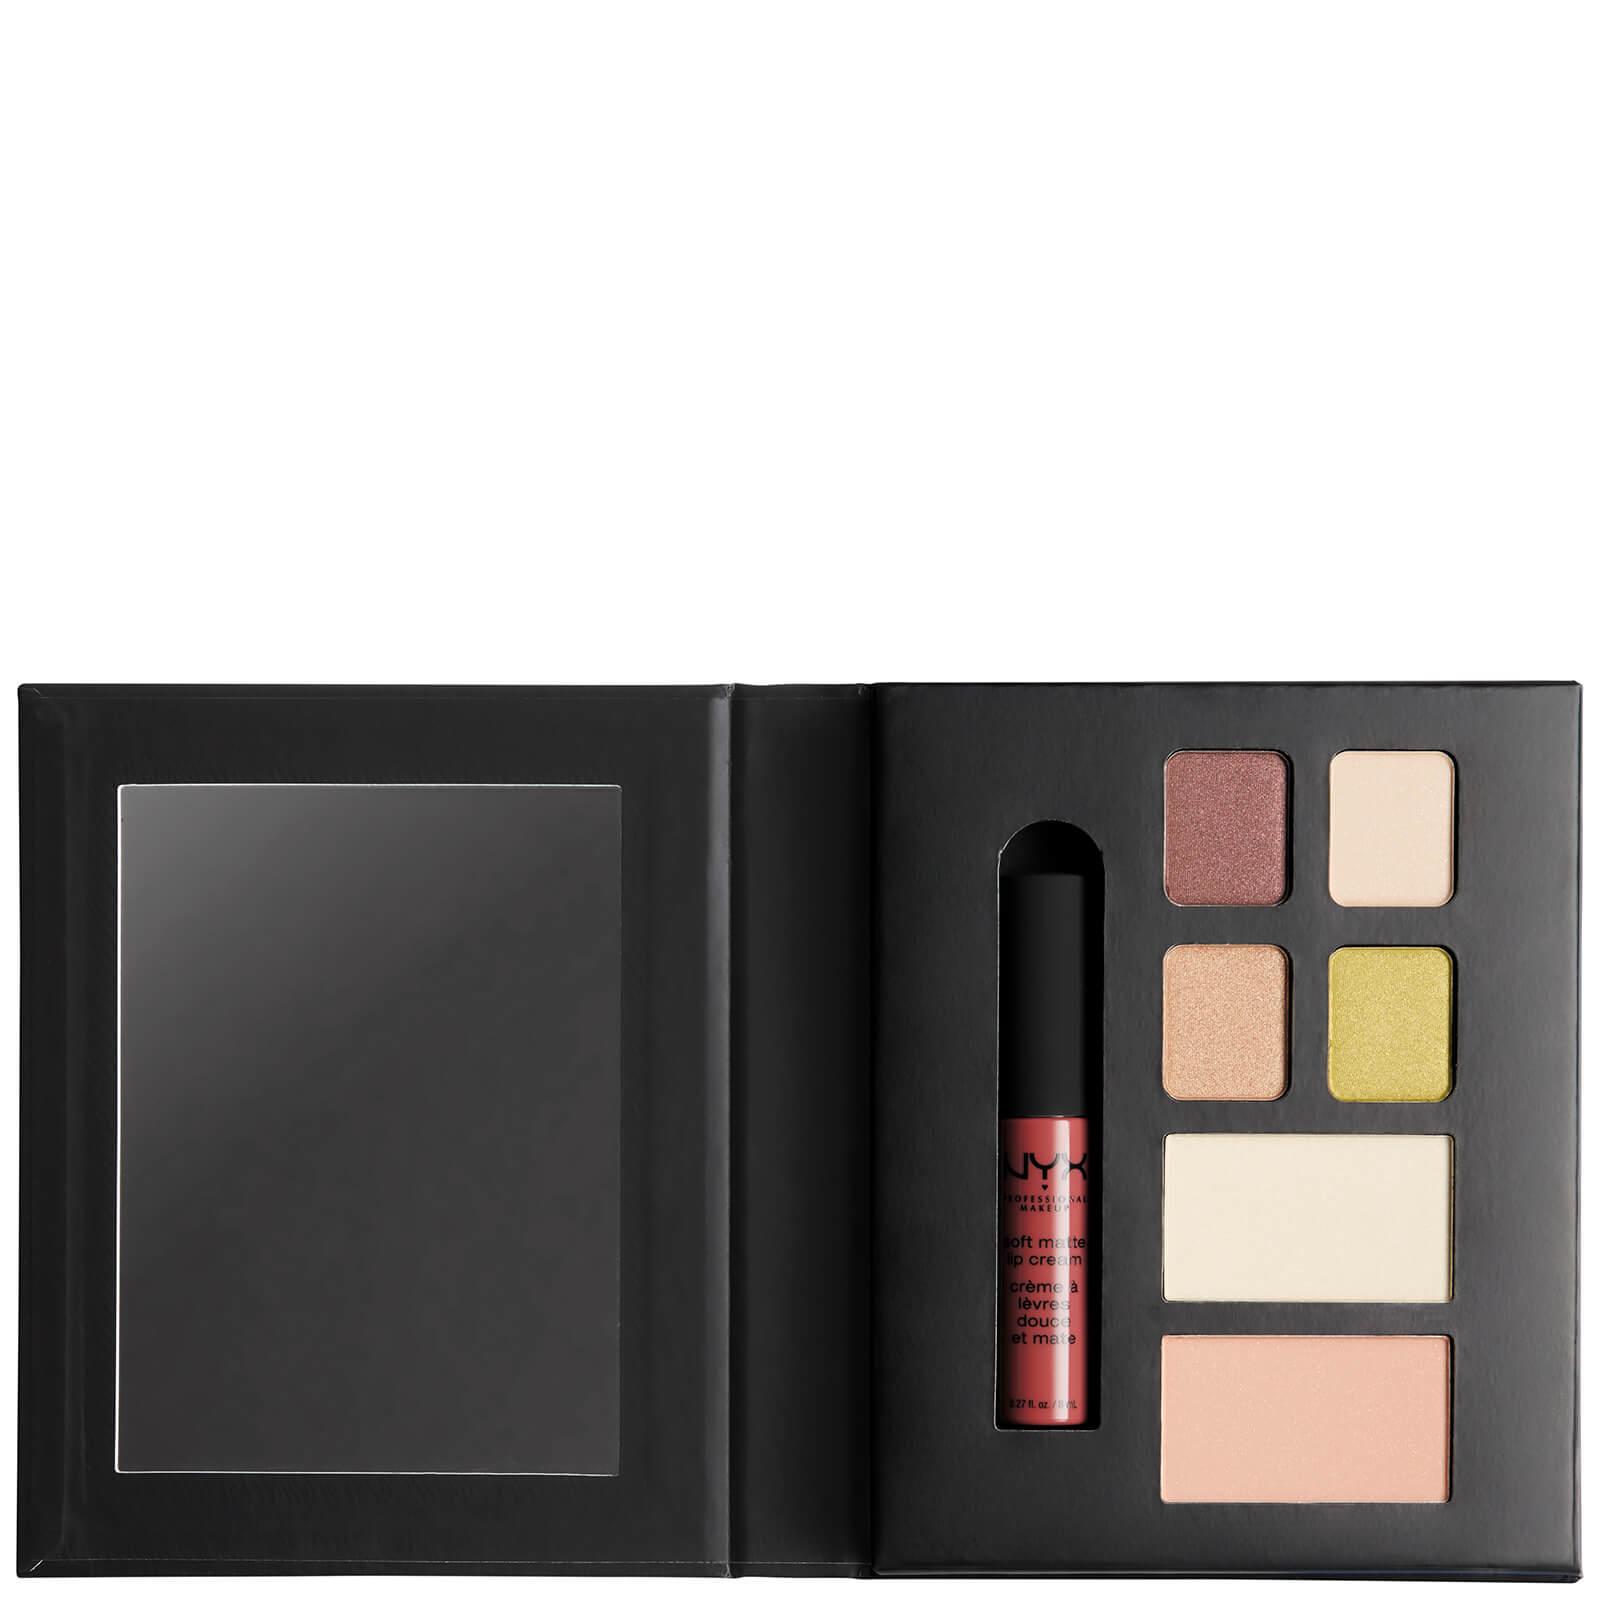 NYX Professional Makeup Wanderlust Lip, Eye & Face Palette - Dublin | Free Shipping | Lookfantastic